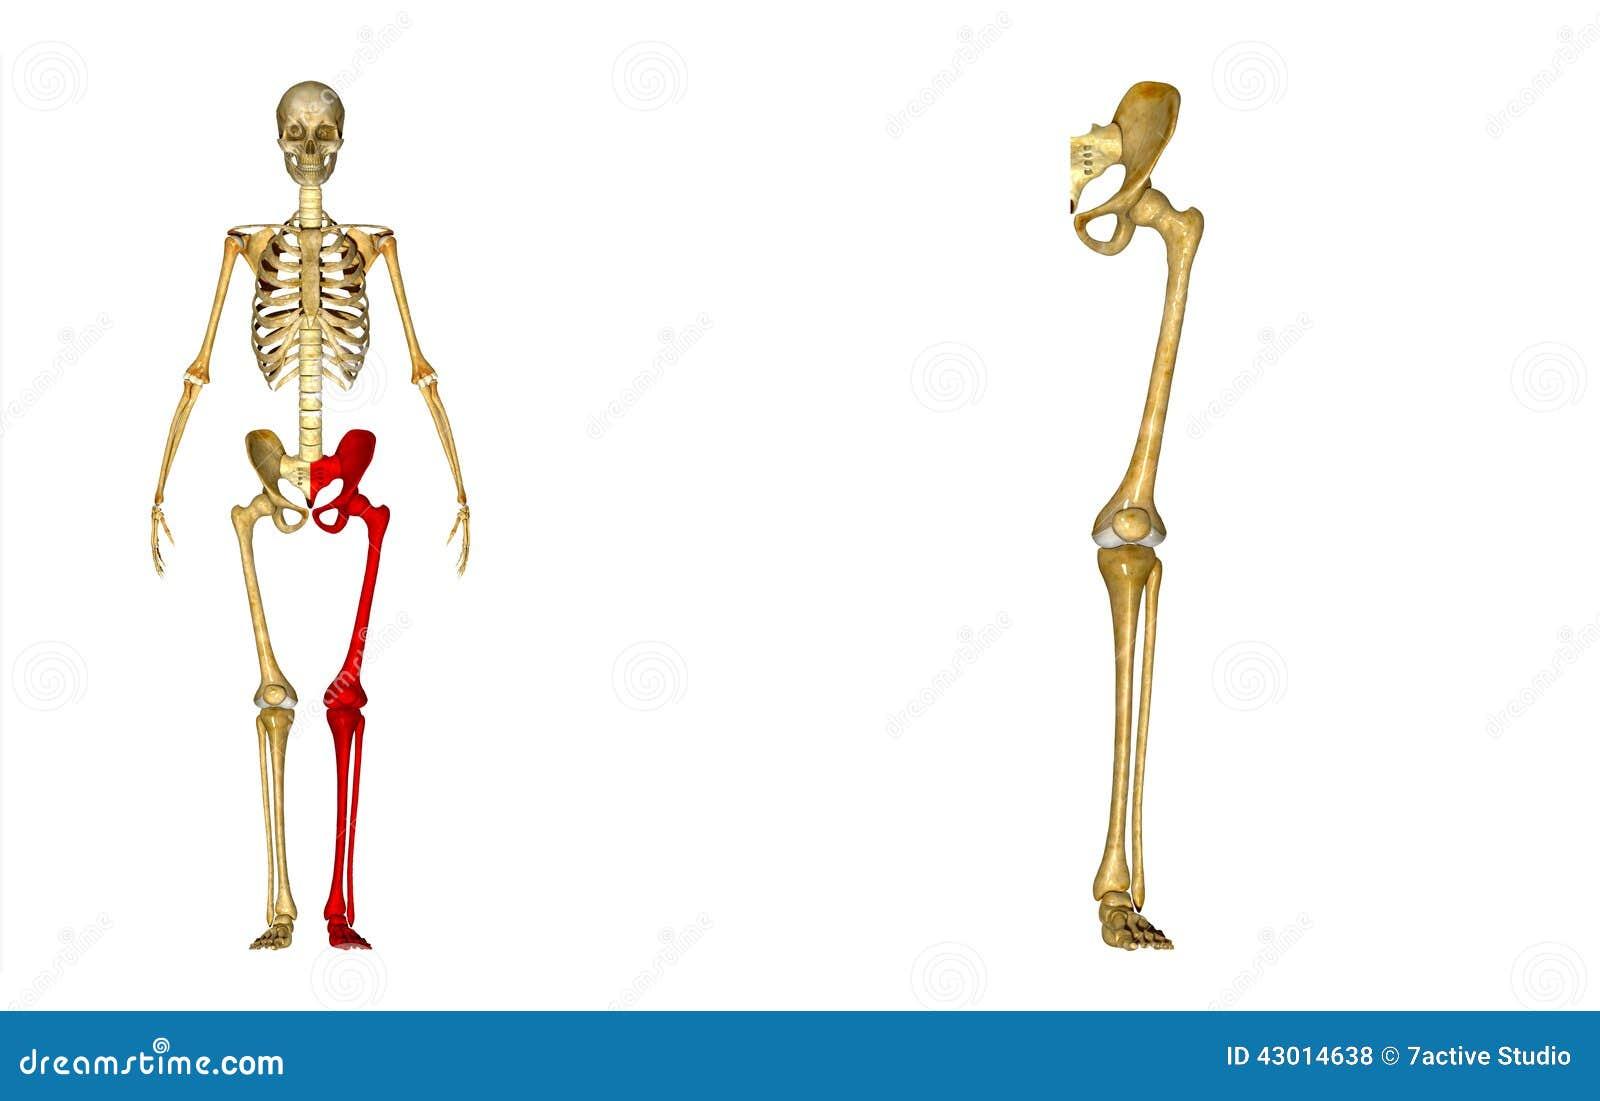 Skeleton Left Leg Bones Hip Femur Tibia Fibula Ankle Foot Bones Joint One Most Important Joints Human on Foot And Ankle Diagram